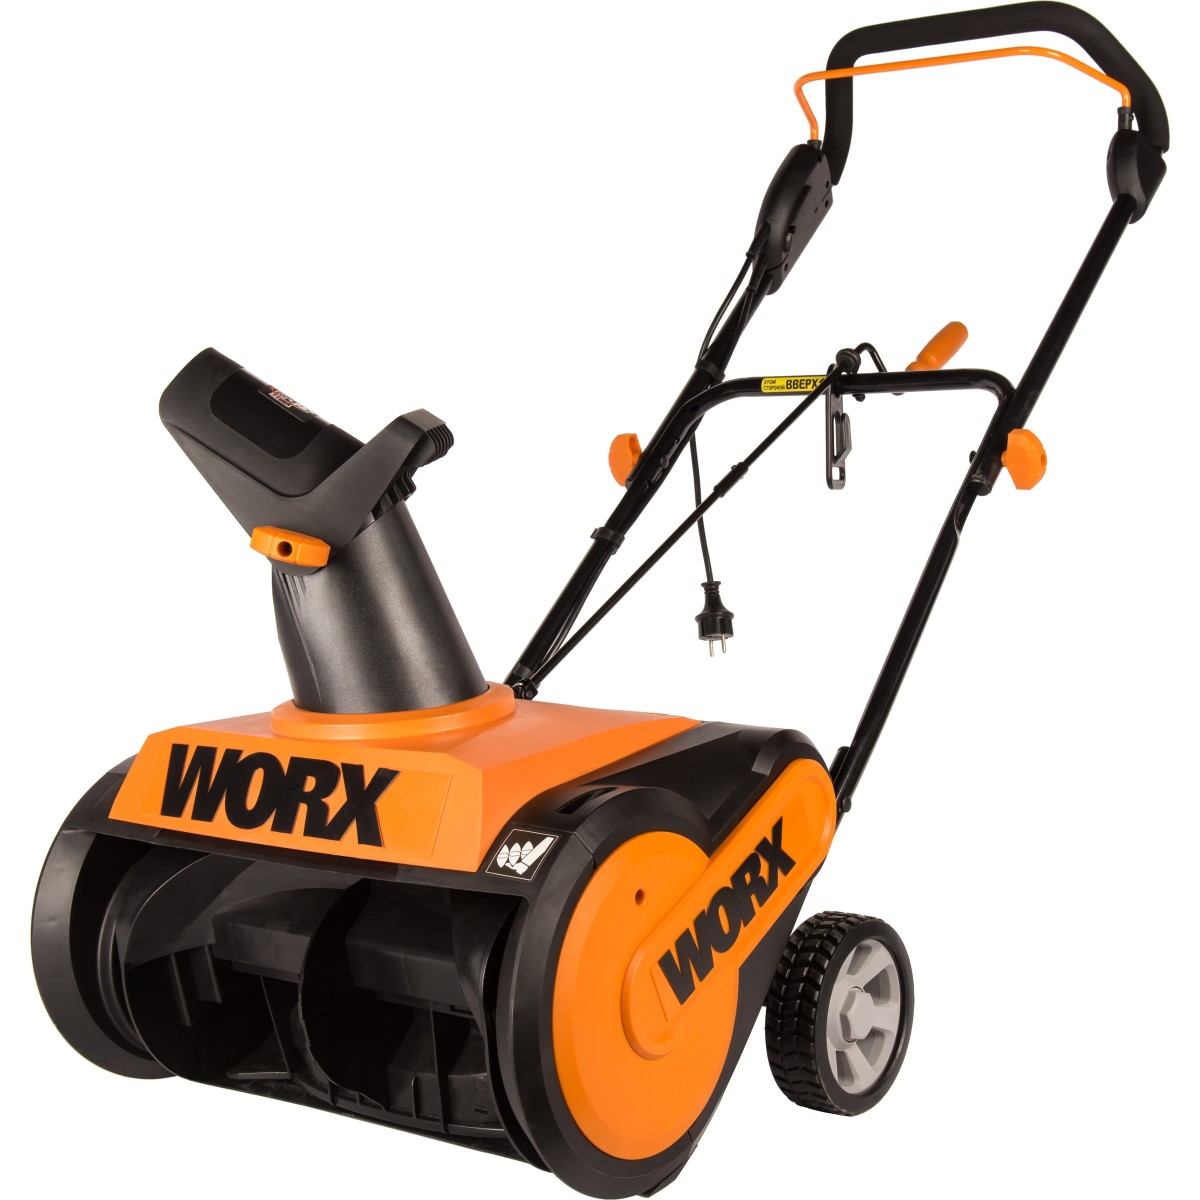 Снегоуборщик электрический Worx WG450E 46 см. 1600 Вт.